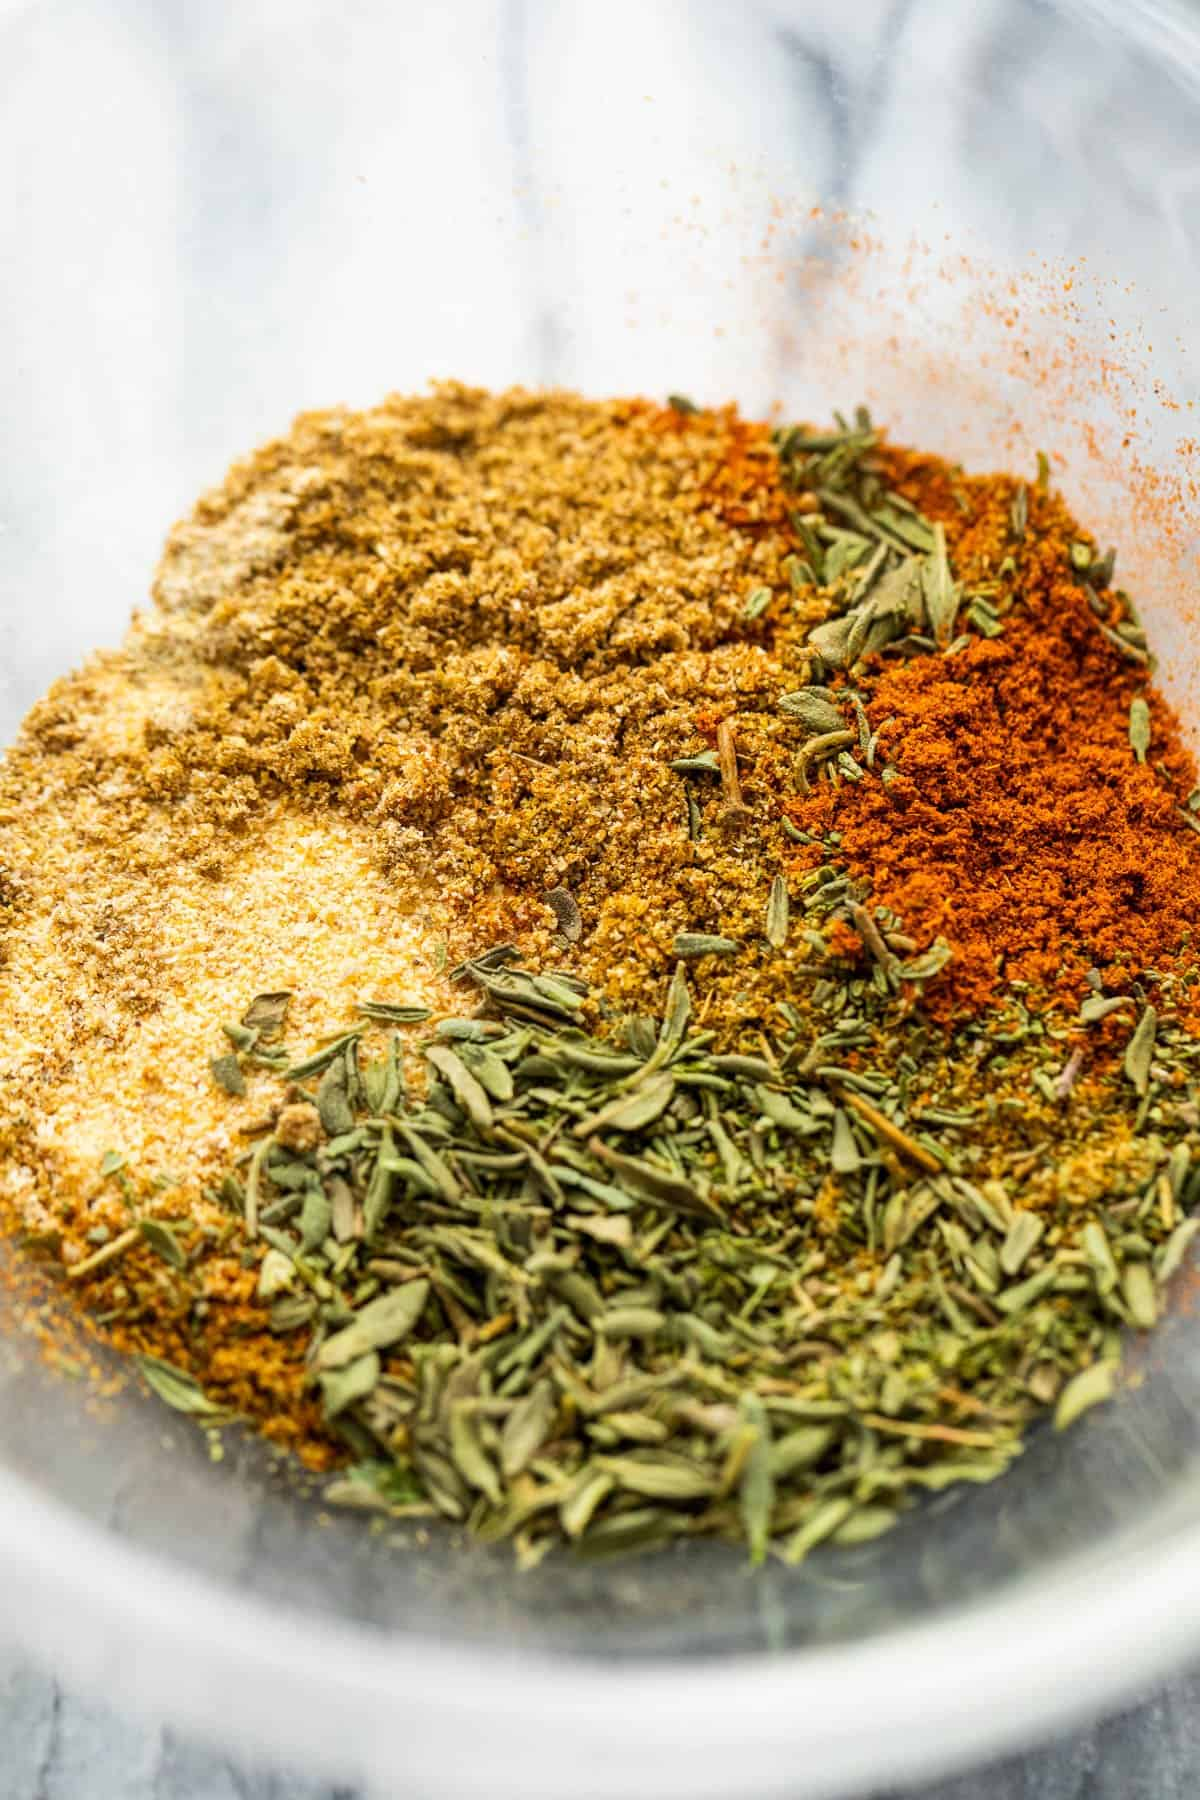 seasoning rub in a glass mixing bowl